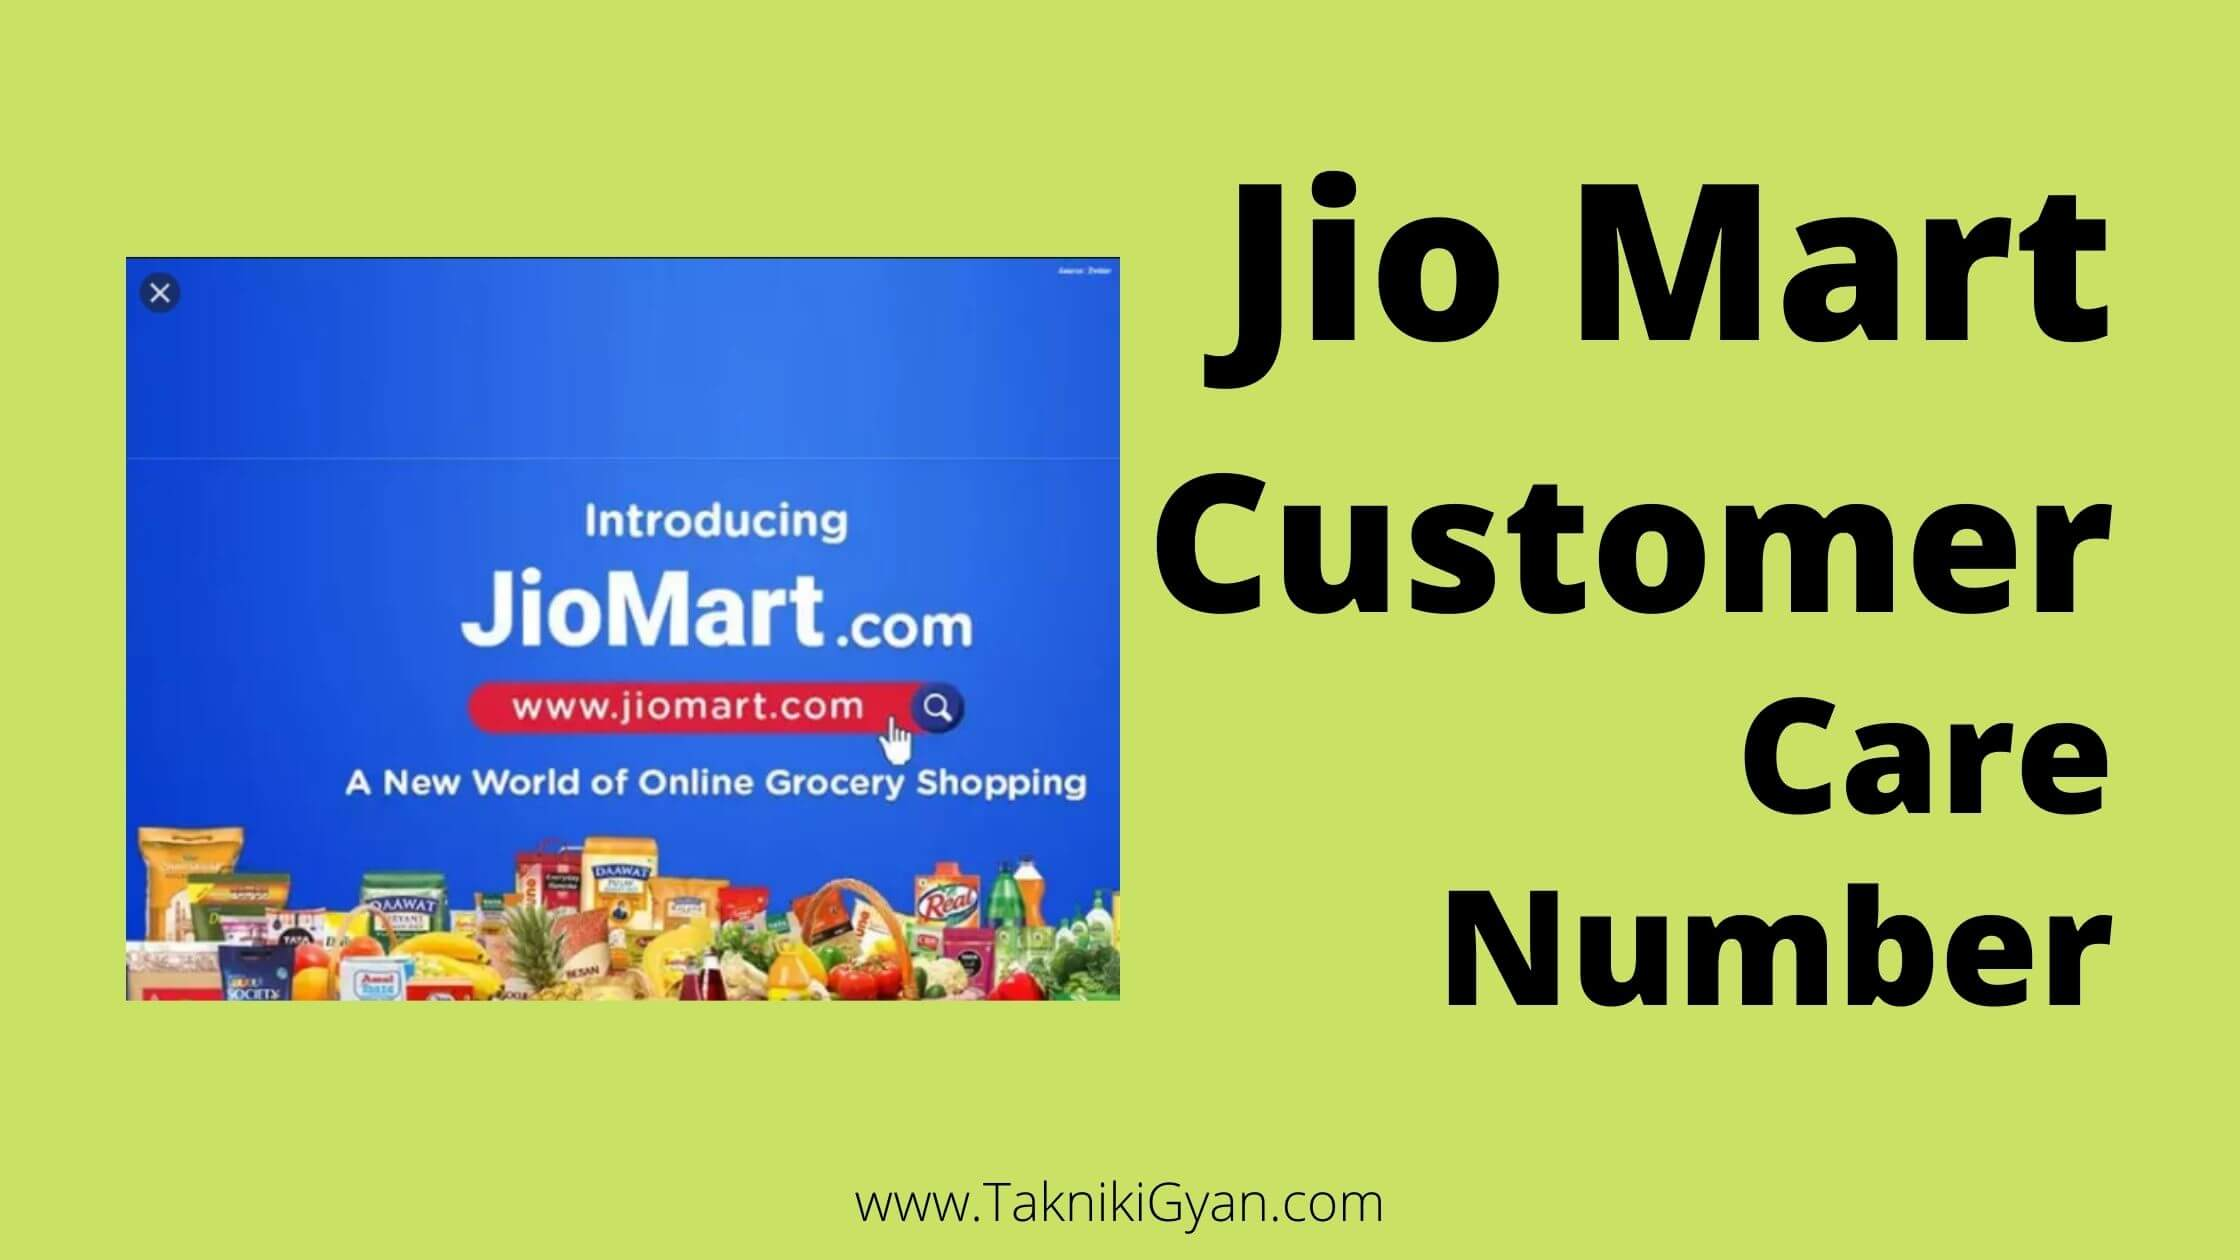 JioMart Customer Care Complaint Number